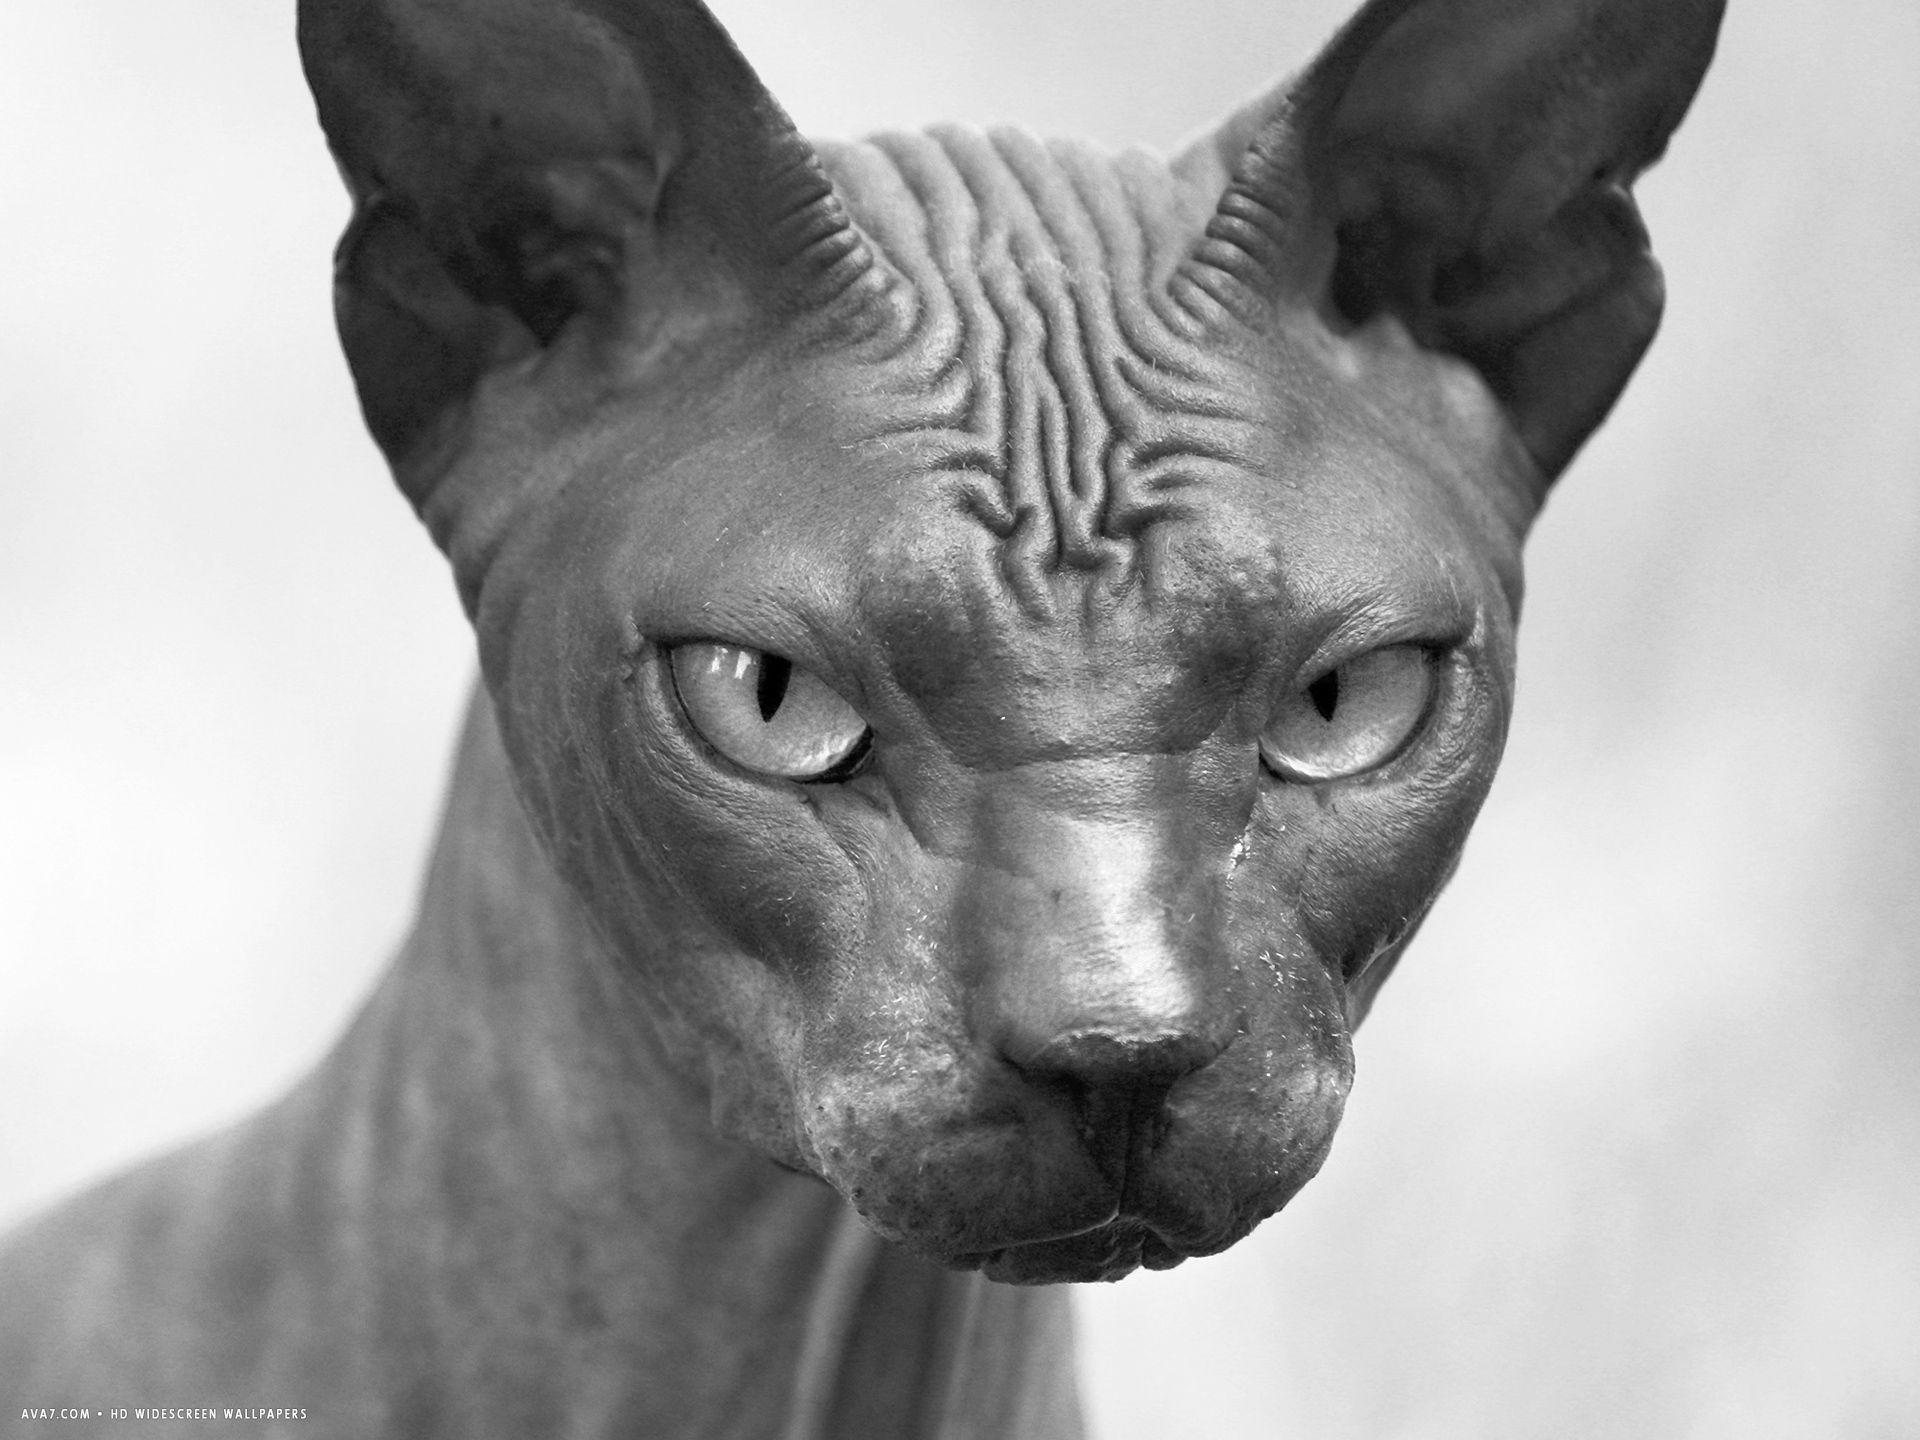 Donskoy Cat: Donskoy S Breed